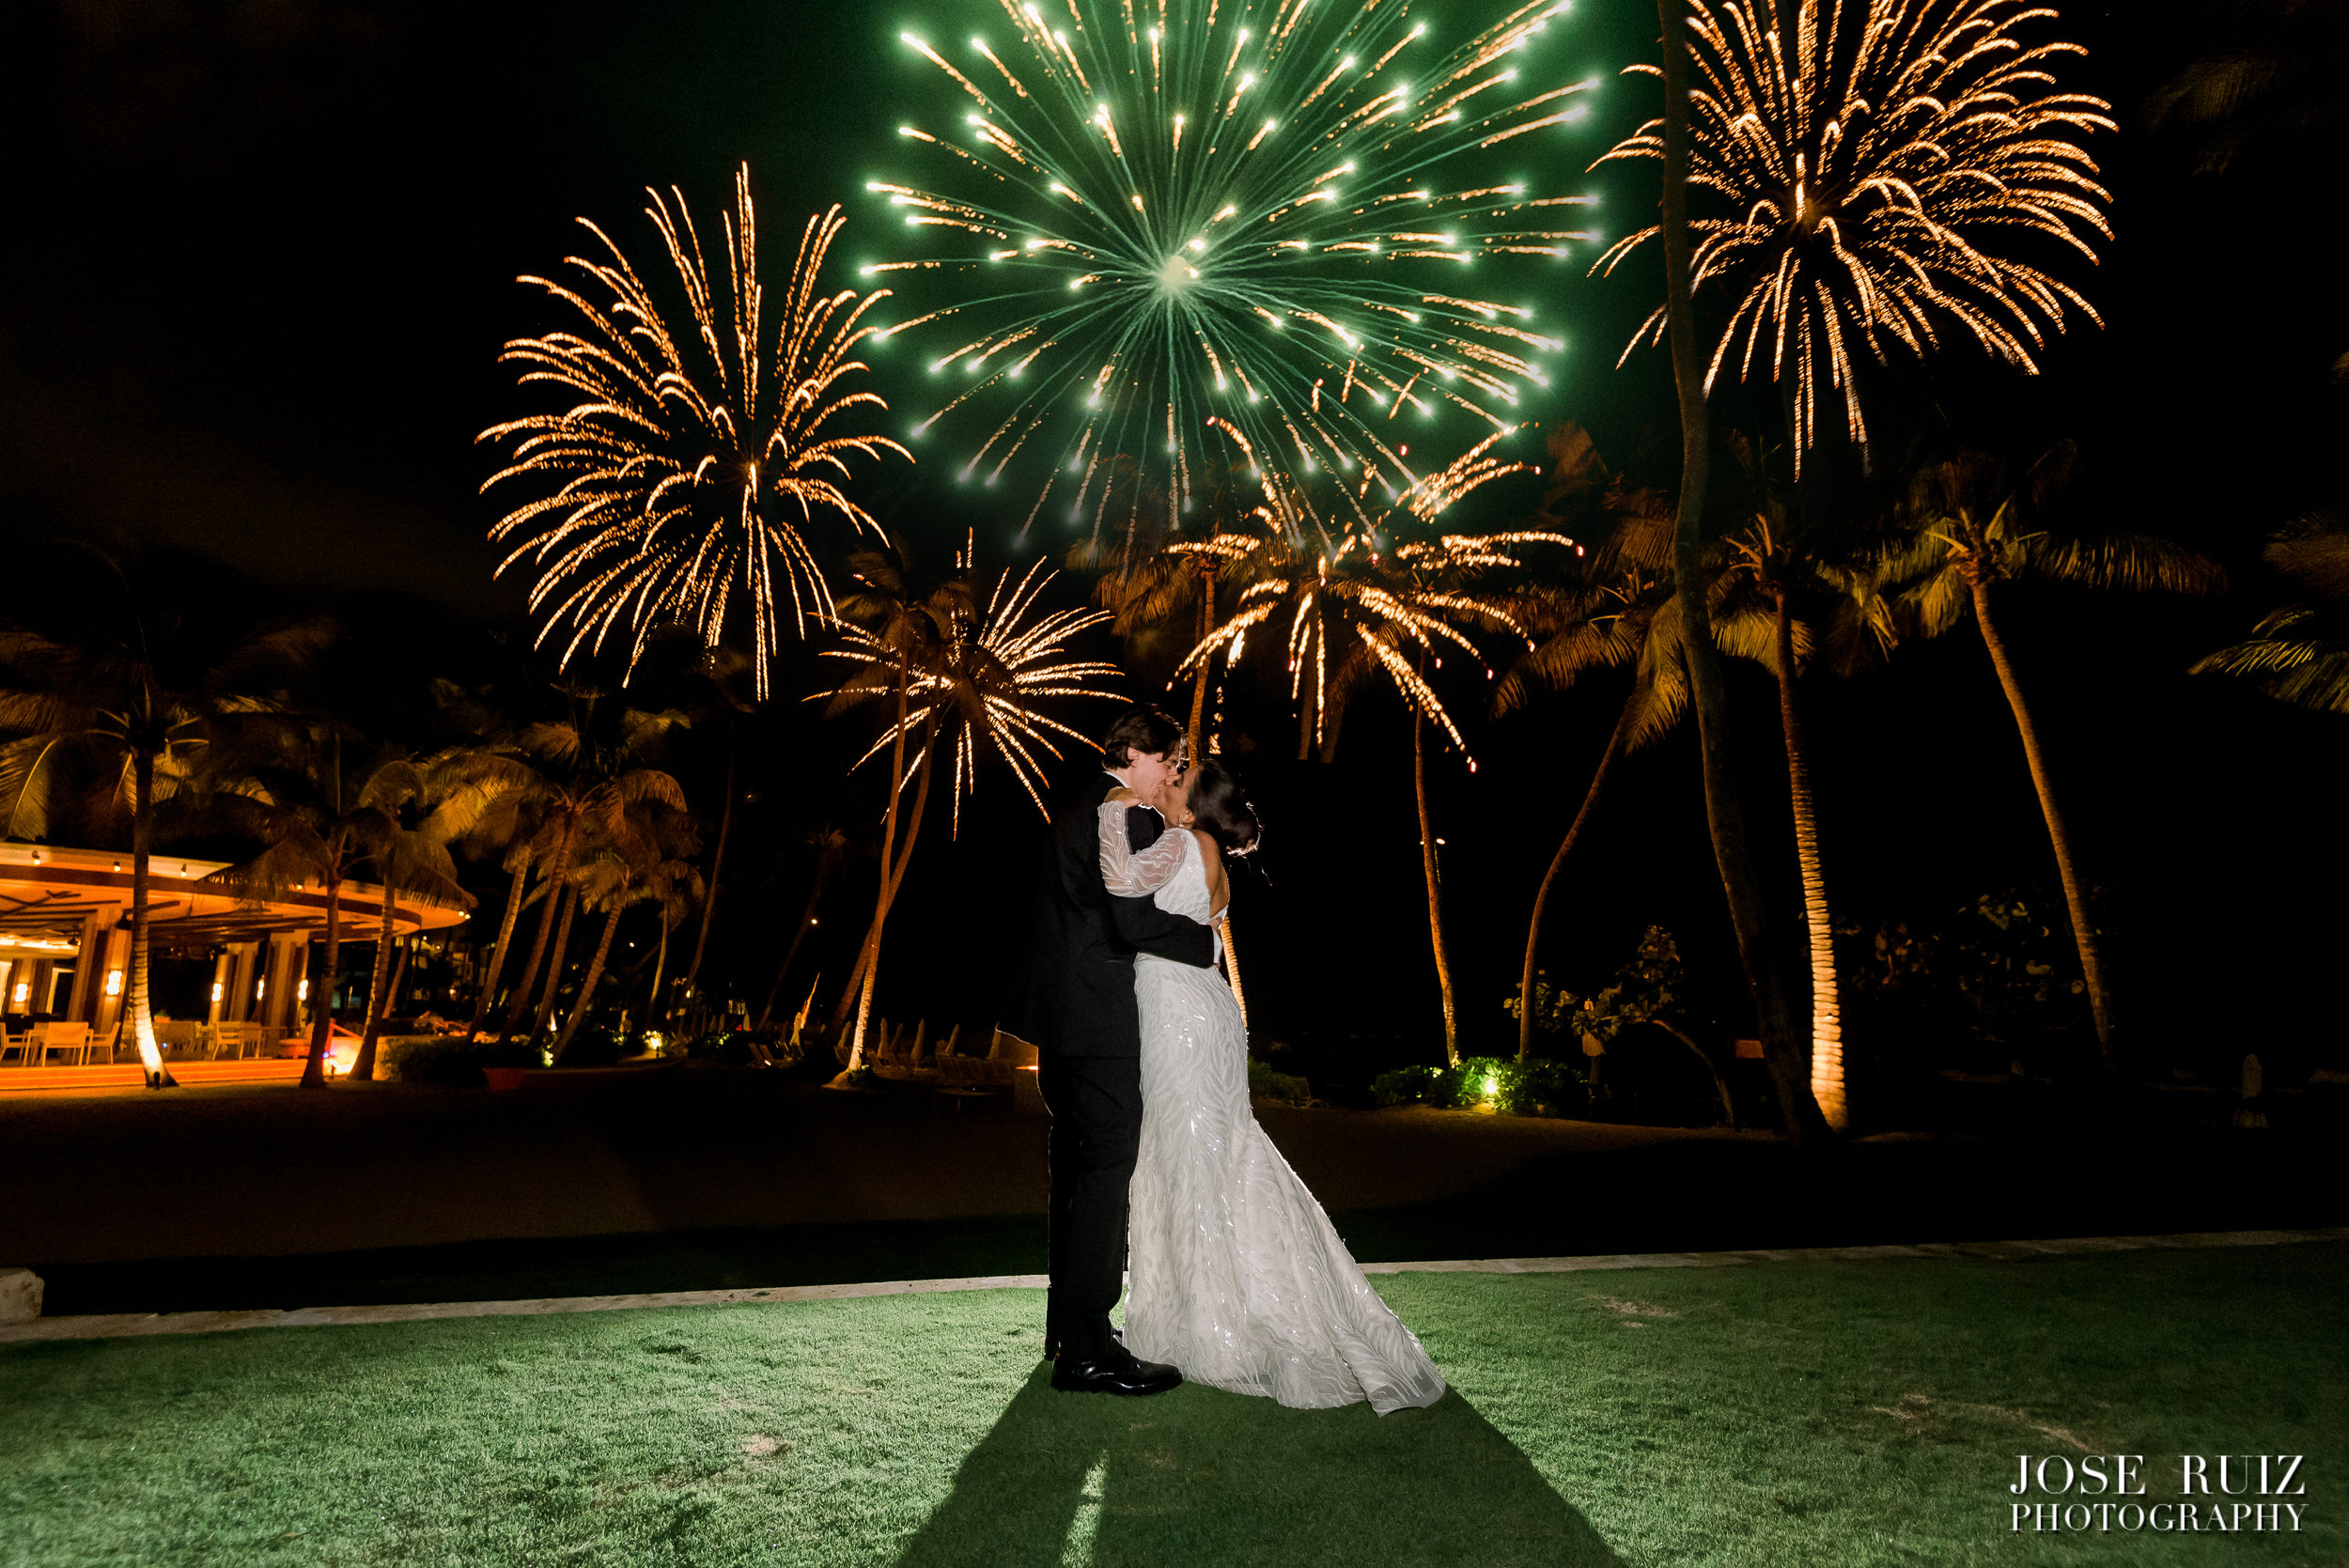 Jose Ruiz Photography- Bianca & Adam Wedding Day-0193.jpg